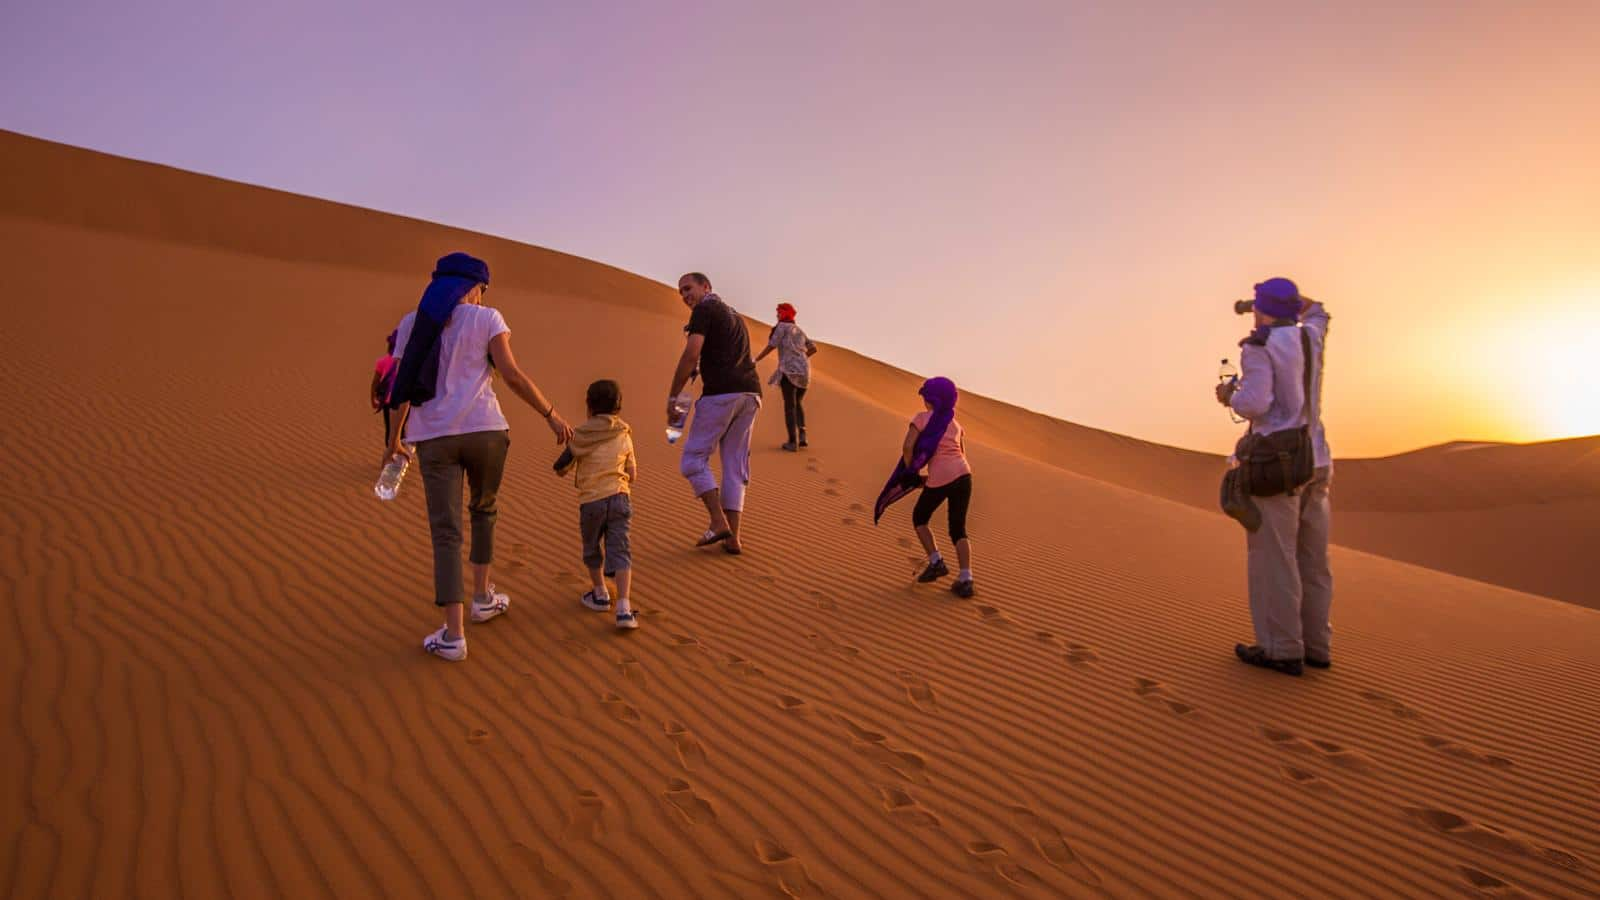 Viajar con niños con VIAJES DESIERTO